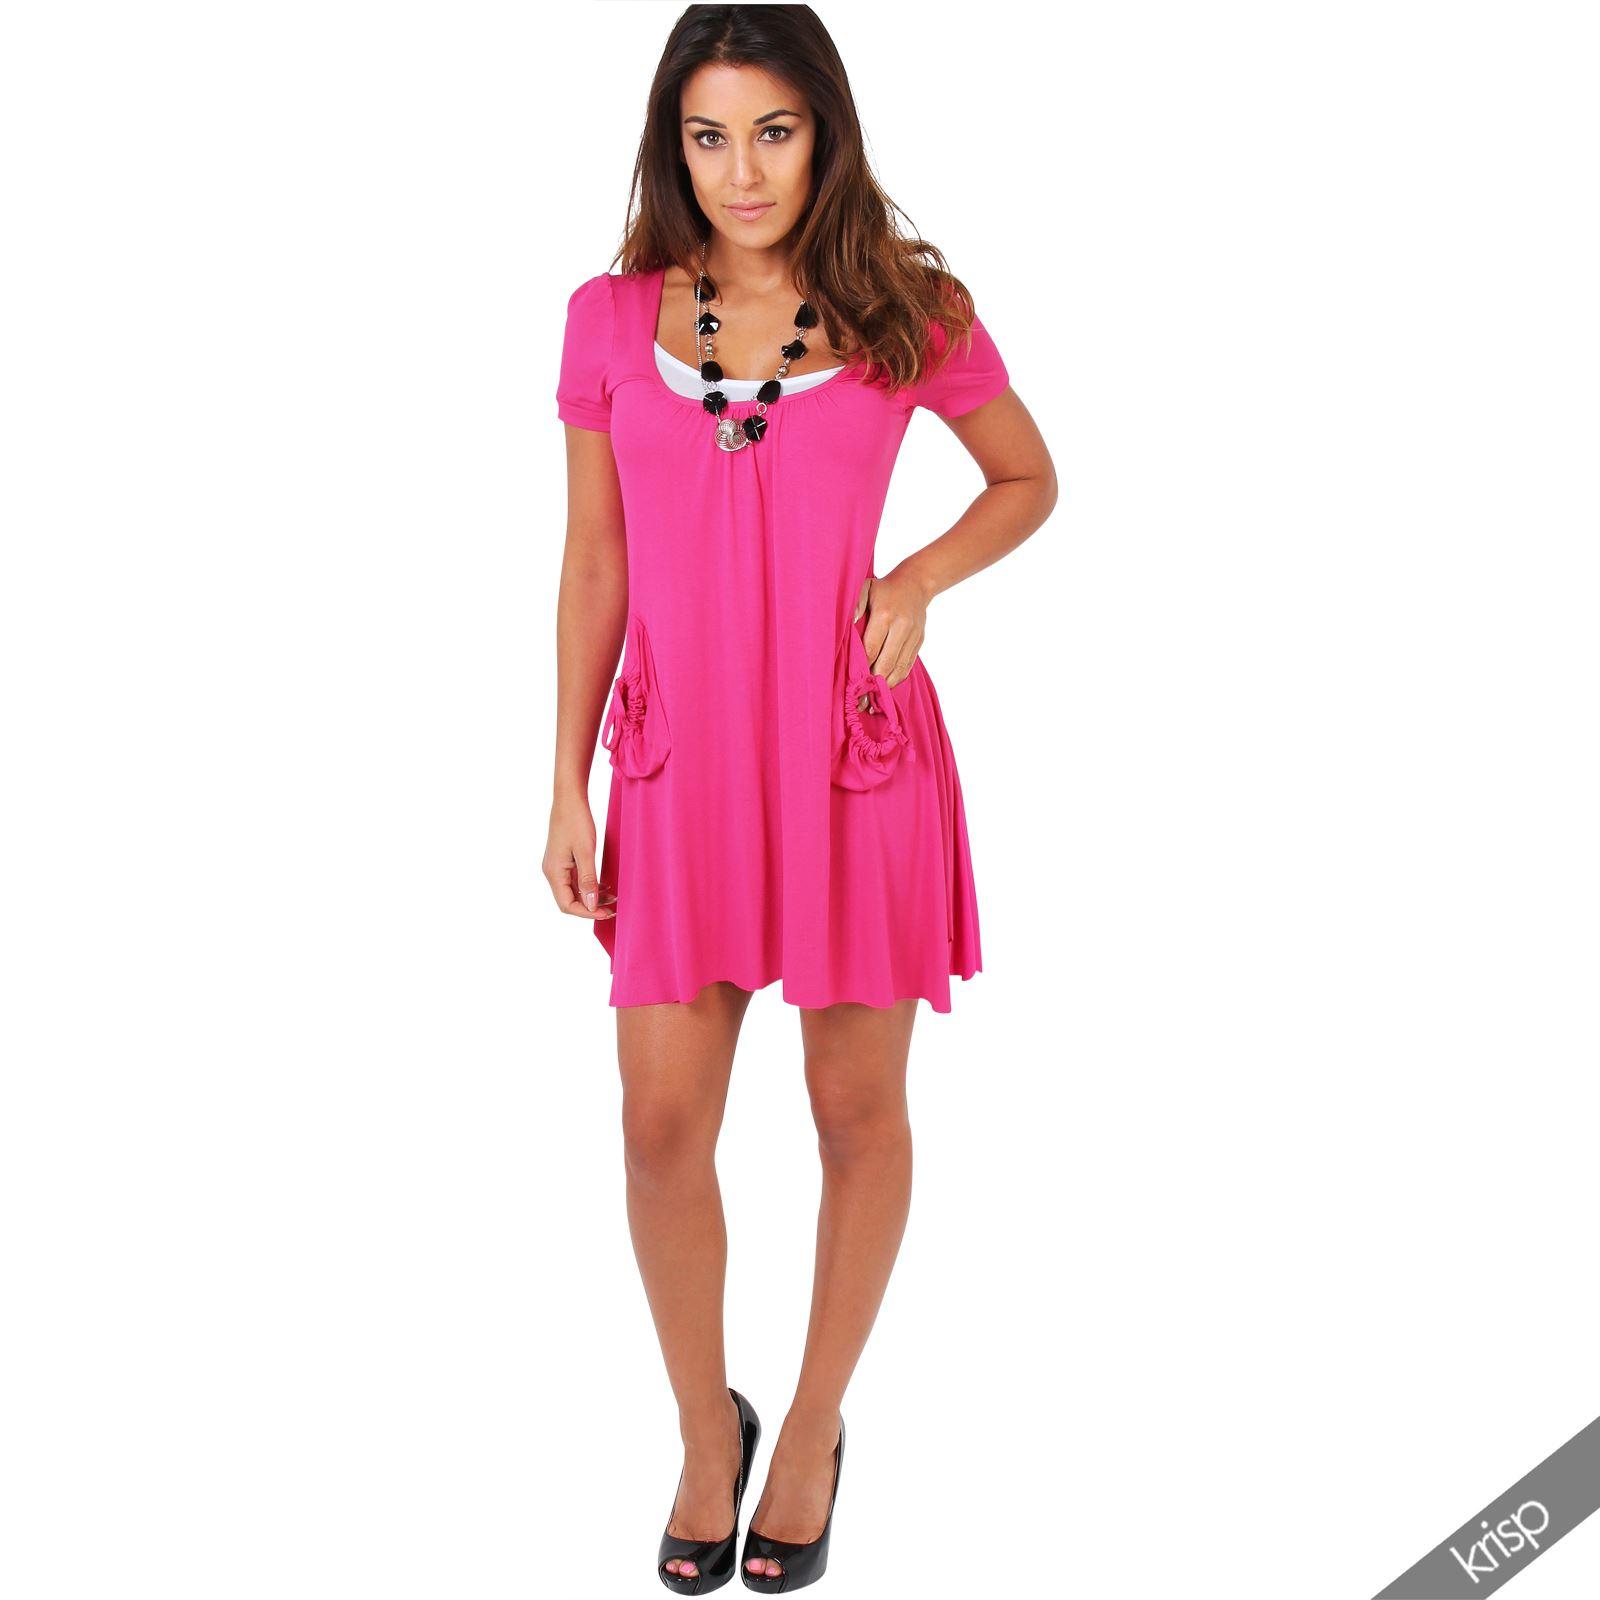 Womens Casual 2 in 1 Short Sleeve Mini Jersey Tunic Dress Loose ...